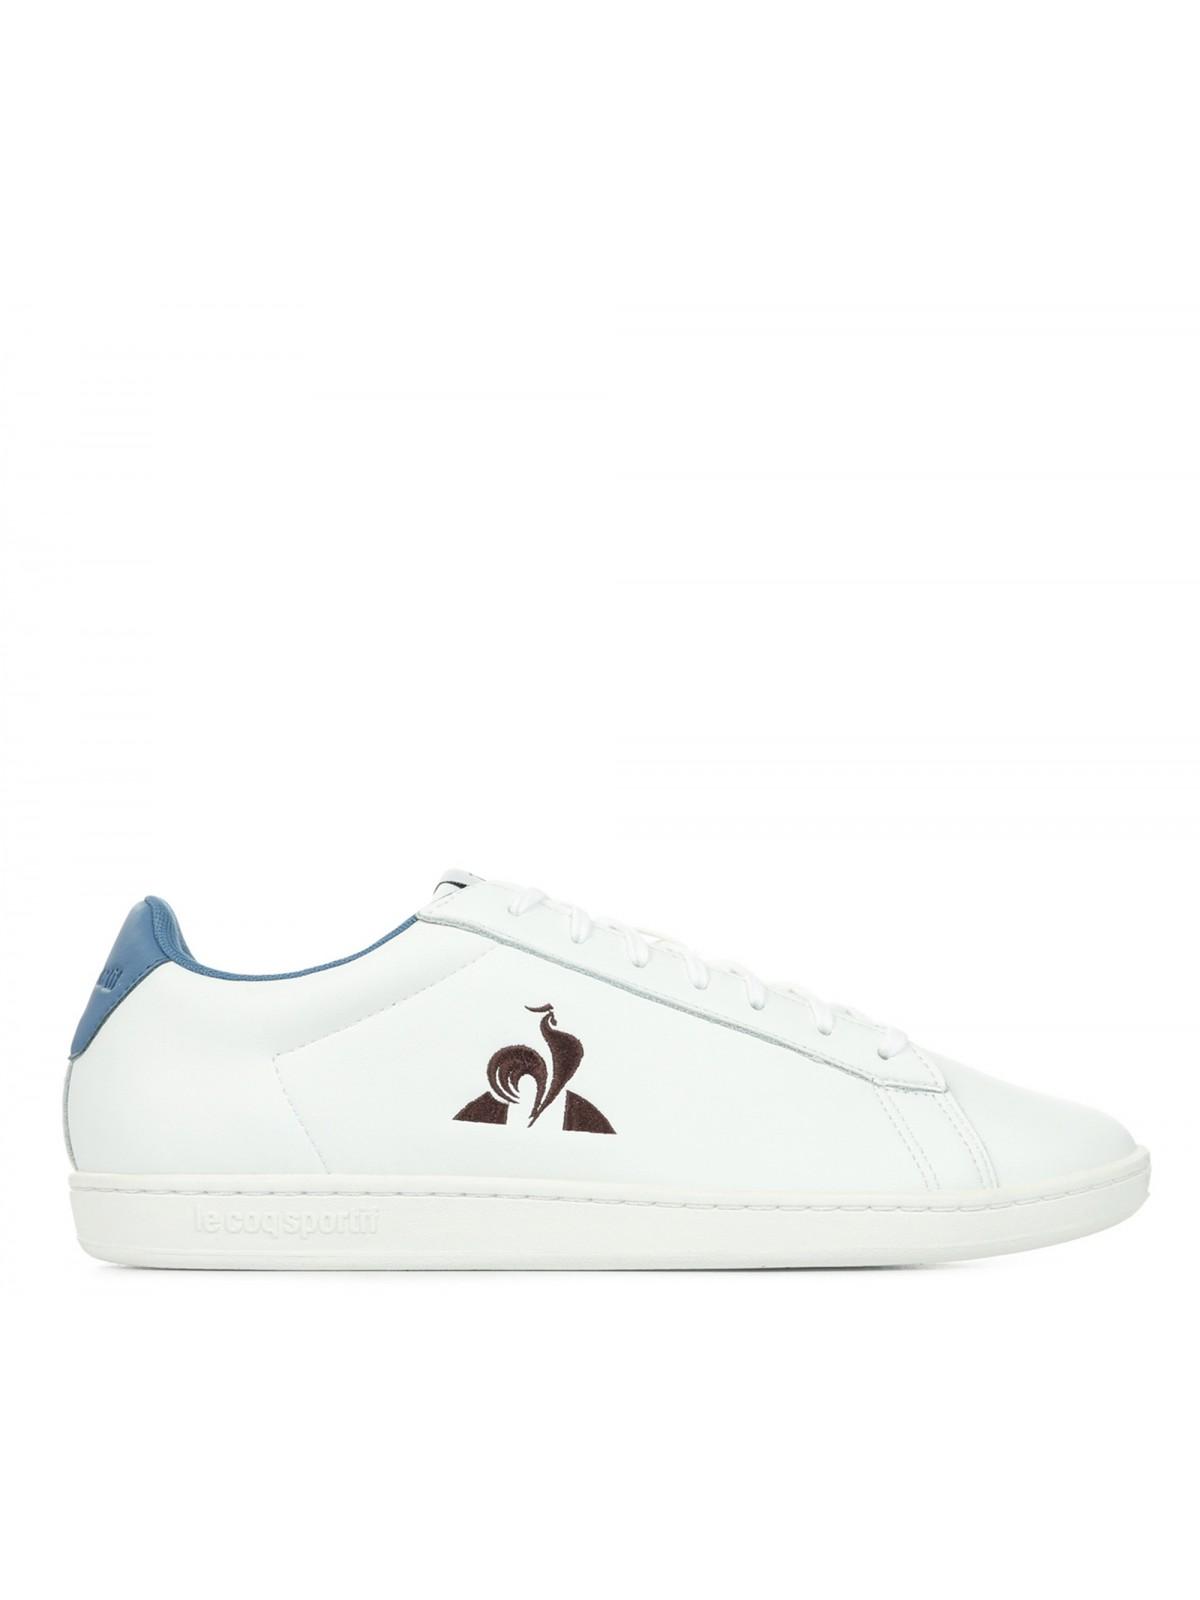 Le Coq Sportif Master Court cuir blanc / andorra